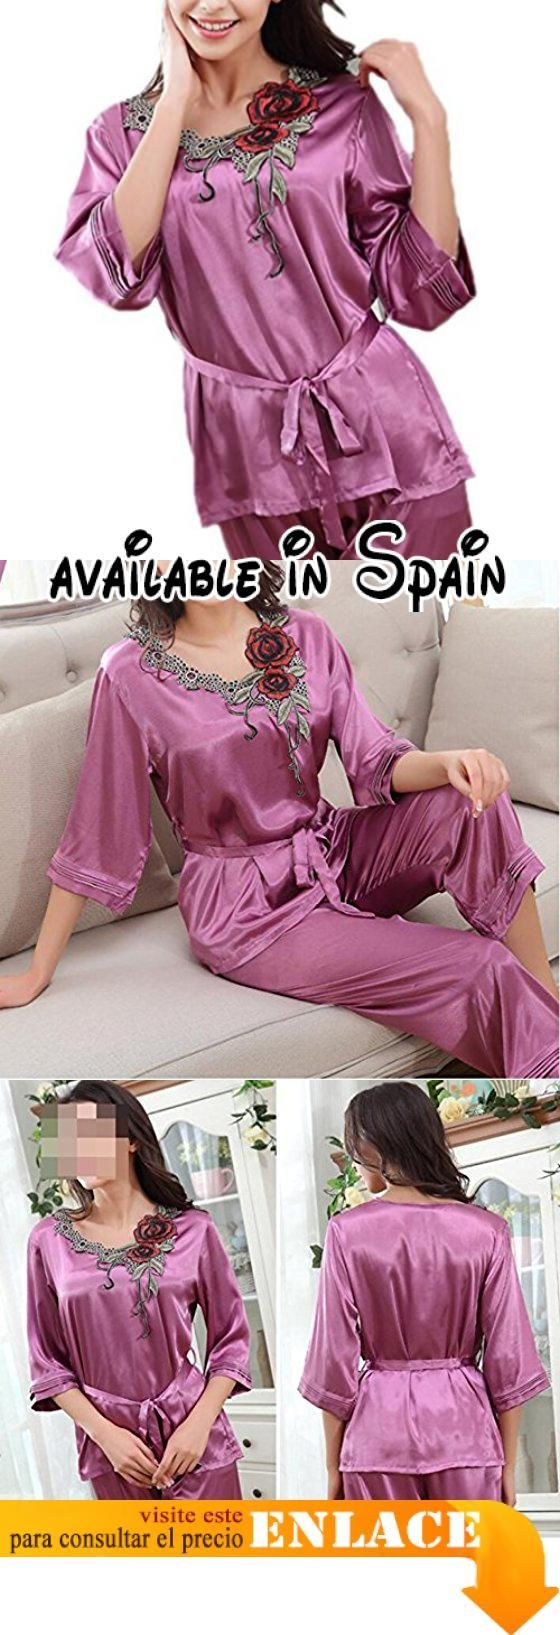 B075ZV1CYR : QPALZM Set De Pijamas De Satén Para Mujer Set De ...